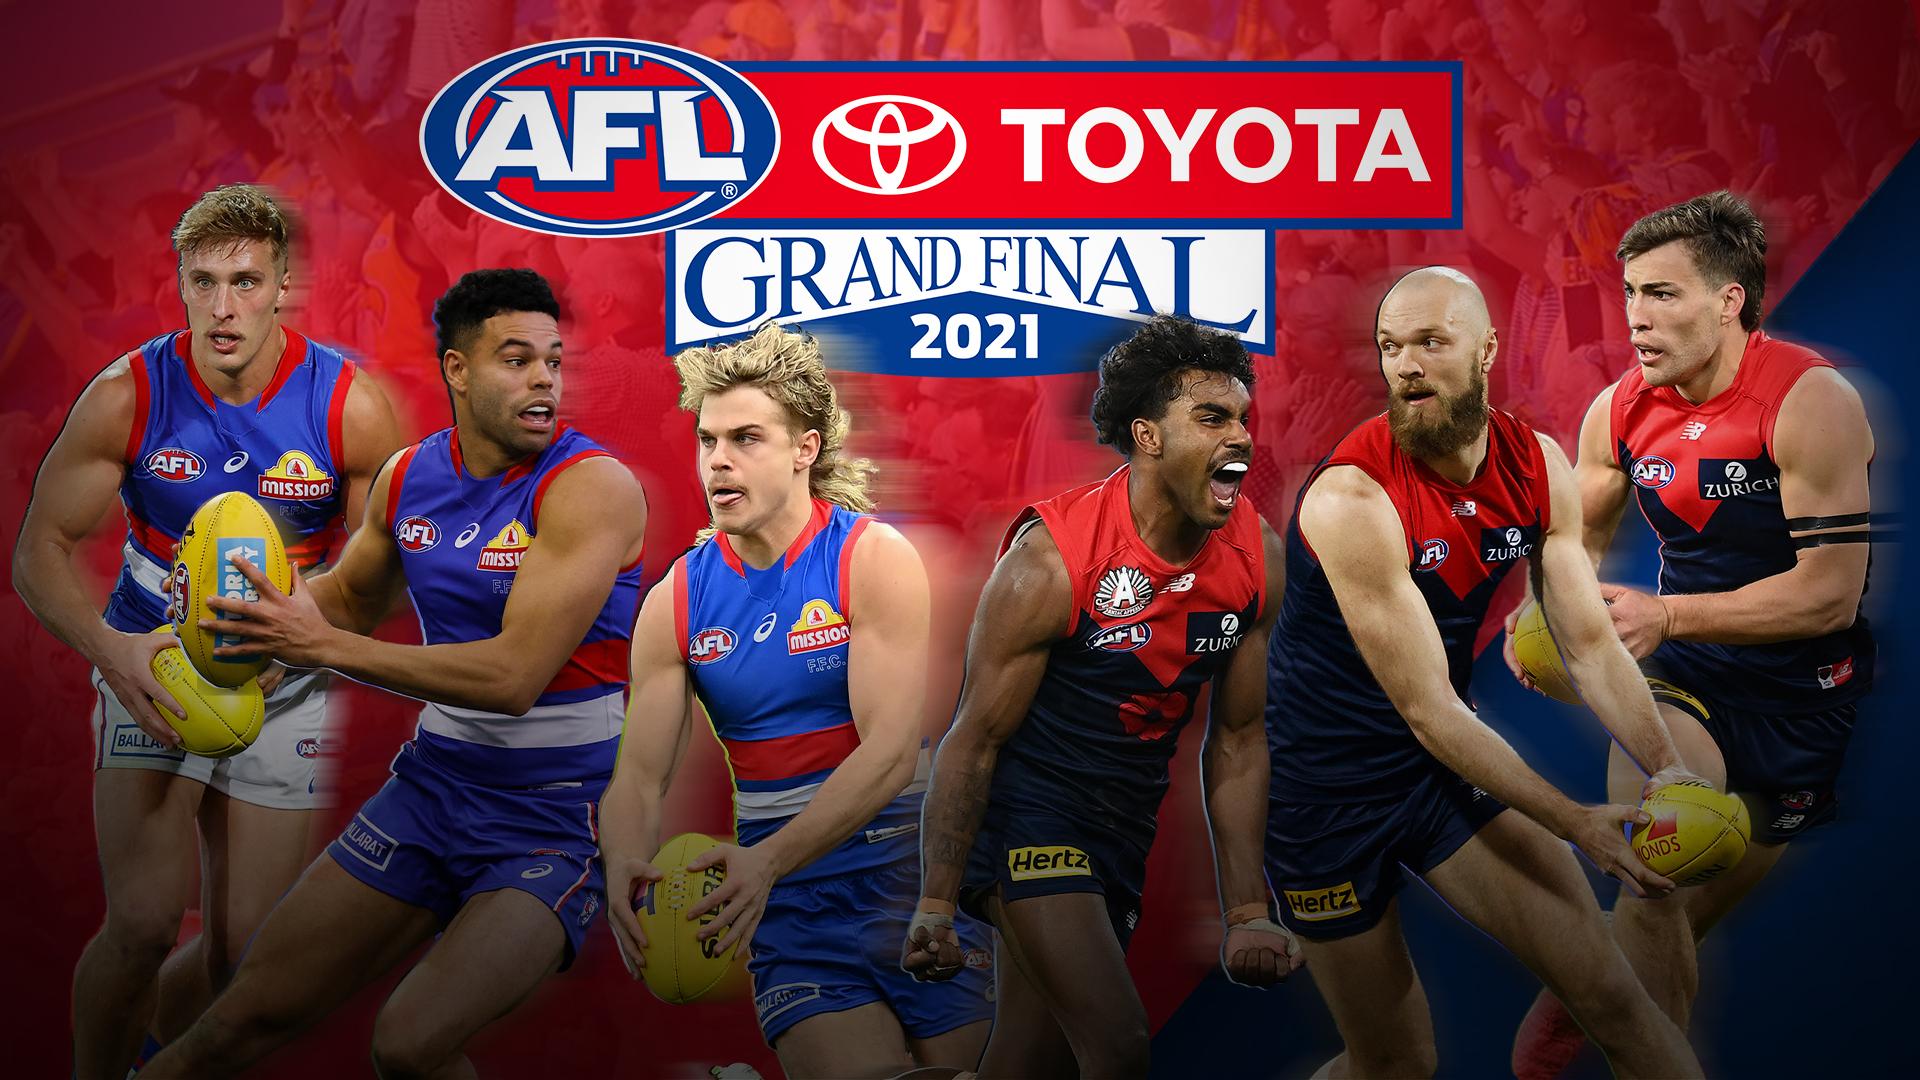 Seven's AFL Grand Final: #1 show of 2021